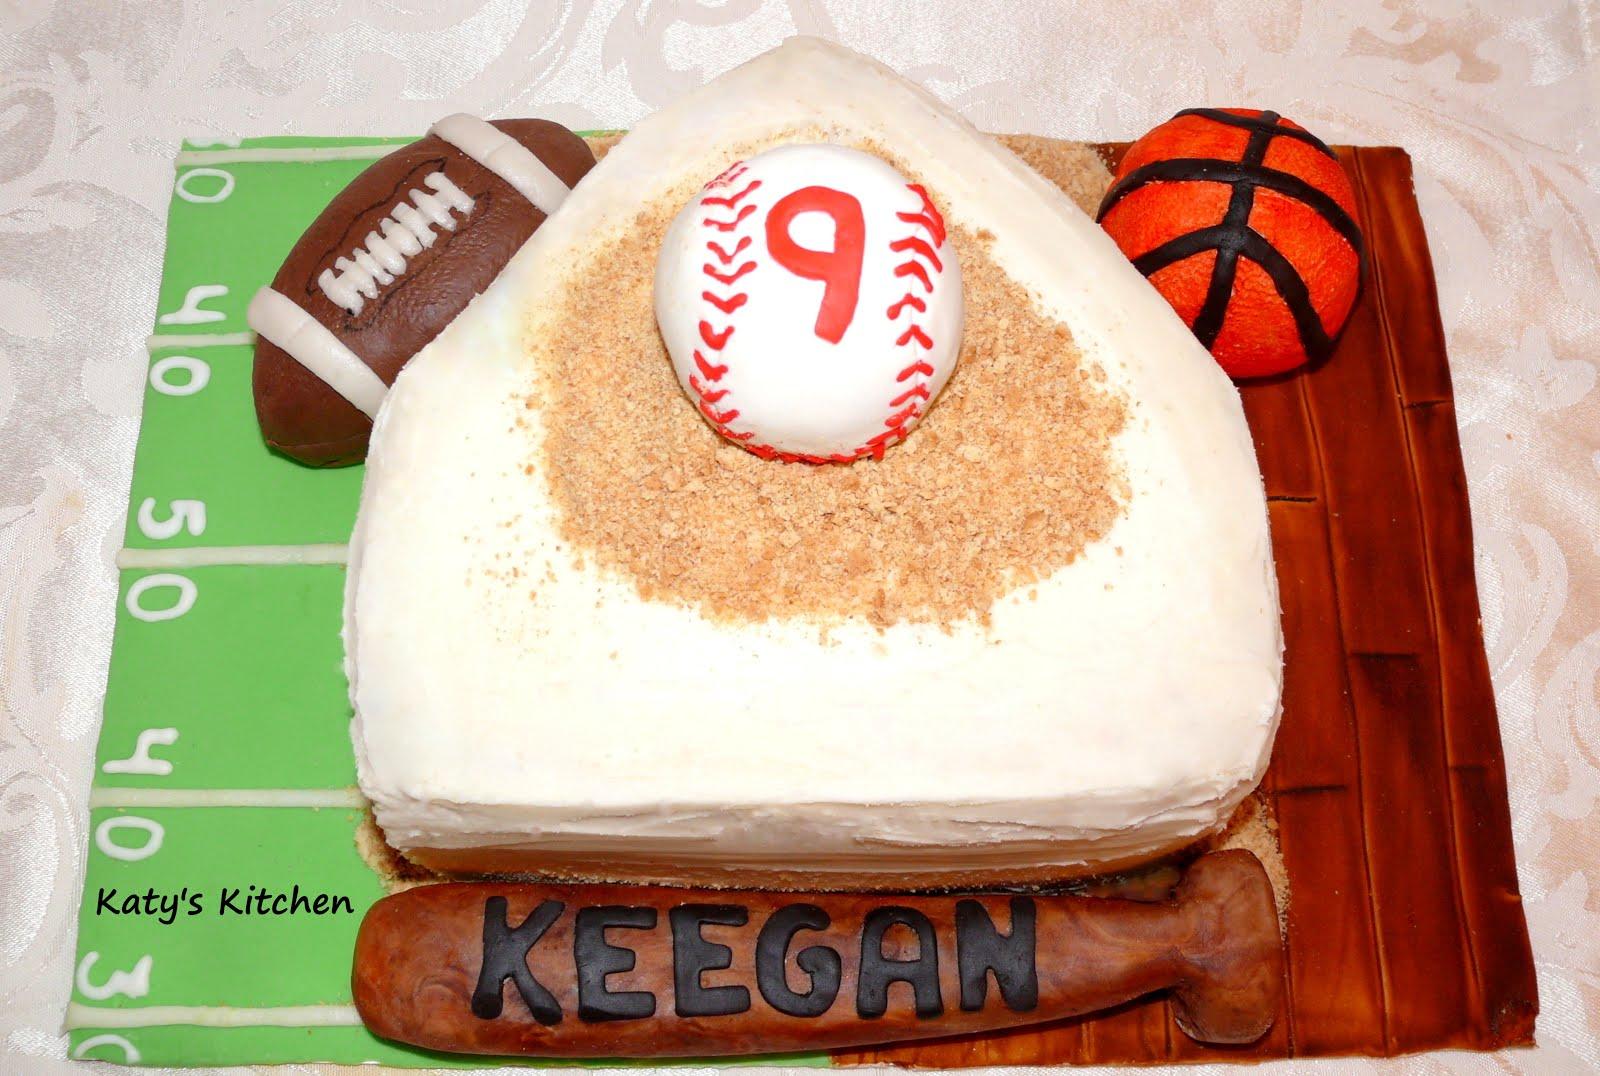 how to make a baseball cake at home